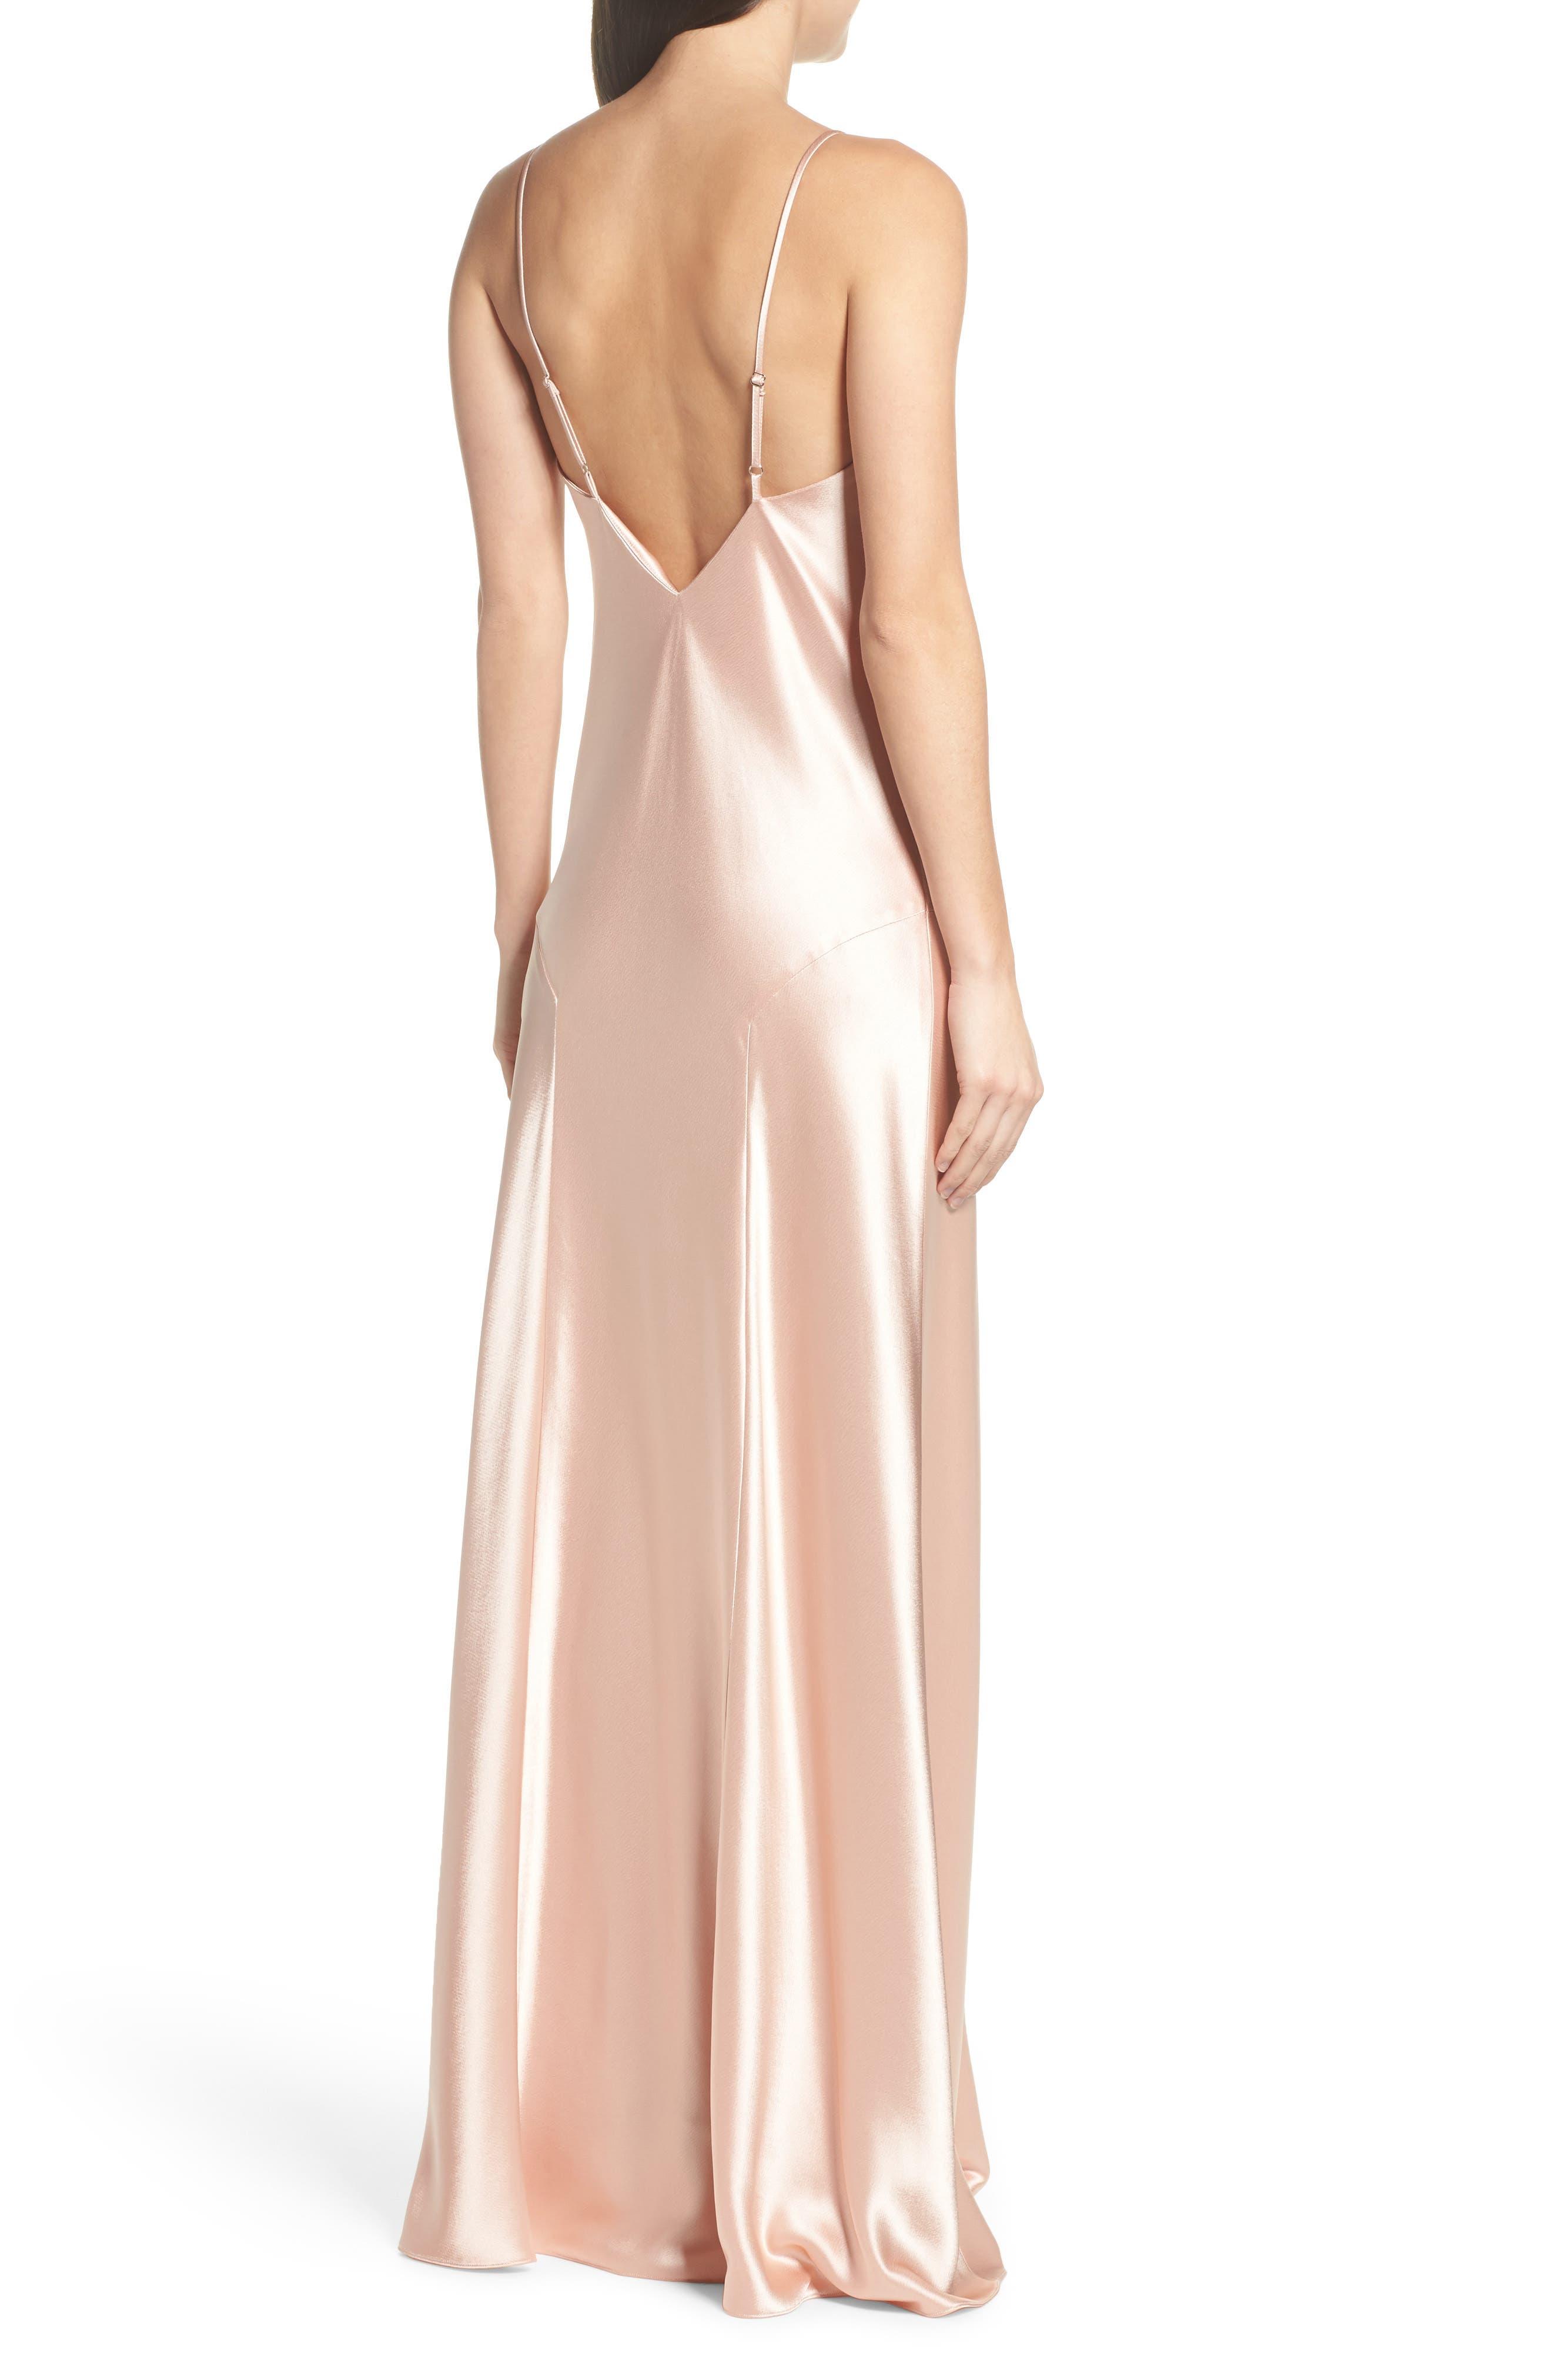 Carmen Embellished Satin Slip Gown,                             Alternate thumbnail 2, color,                             691